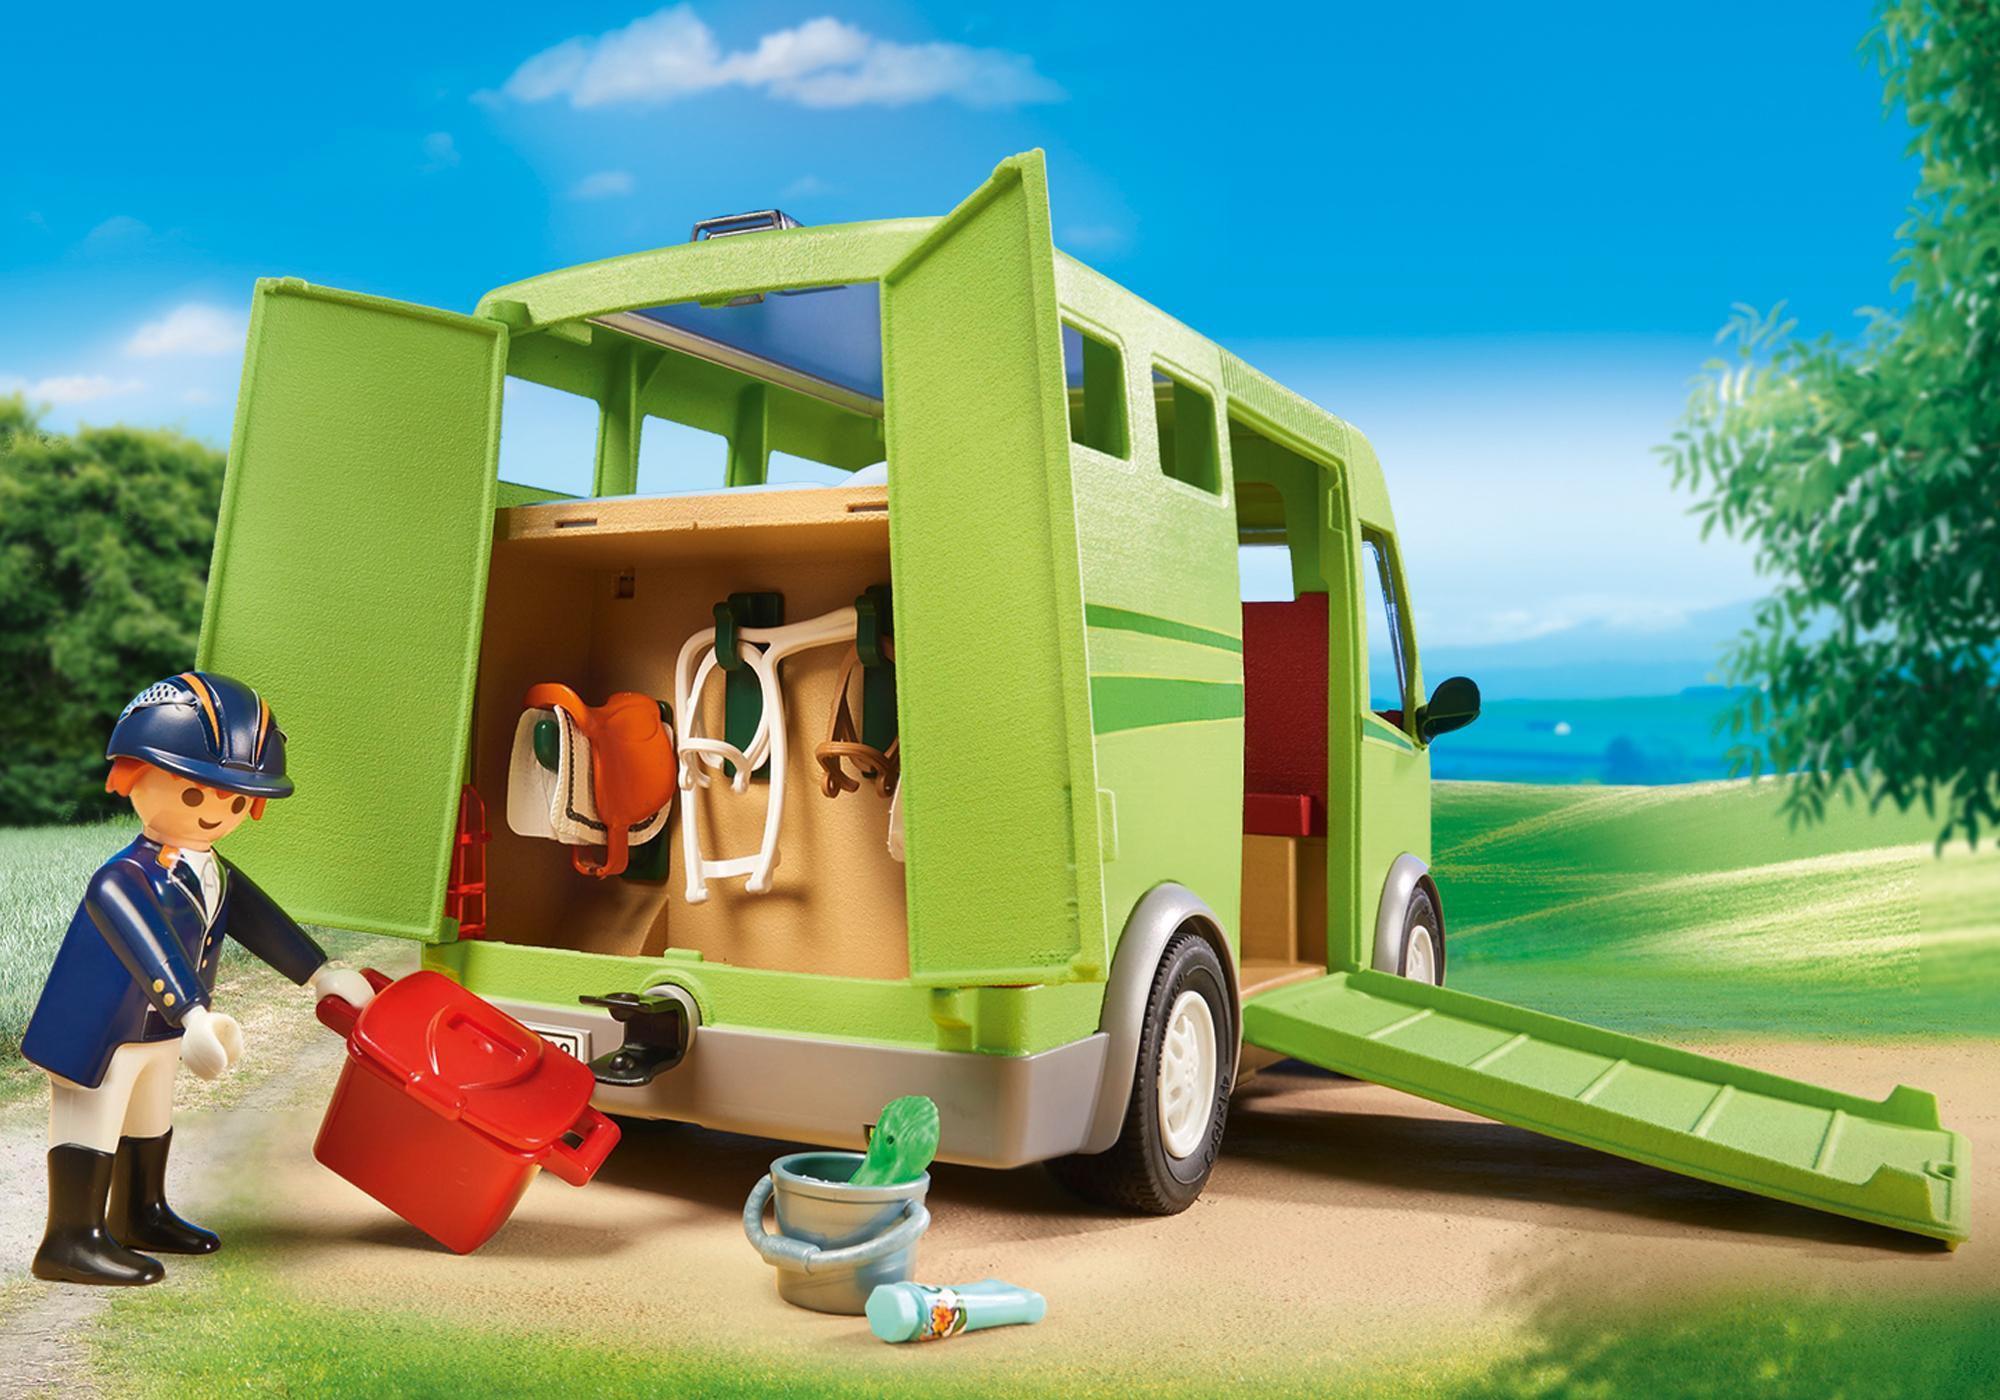 http://media.playmobil.com/i/playmobil/6928_product_extra2